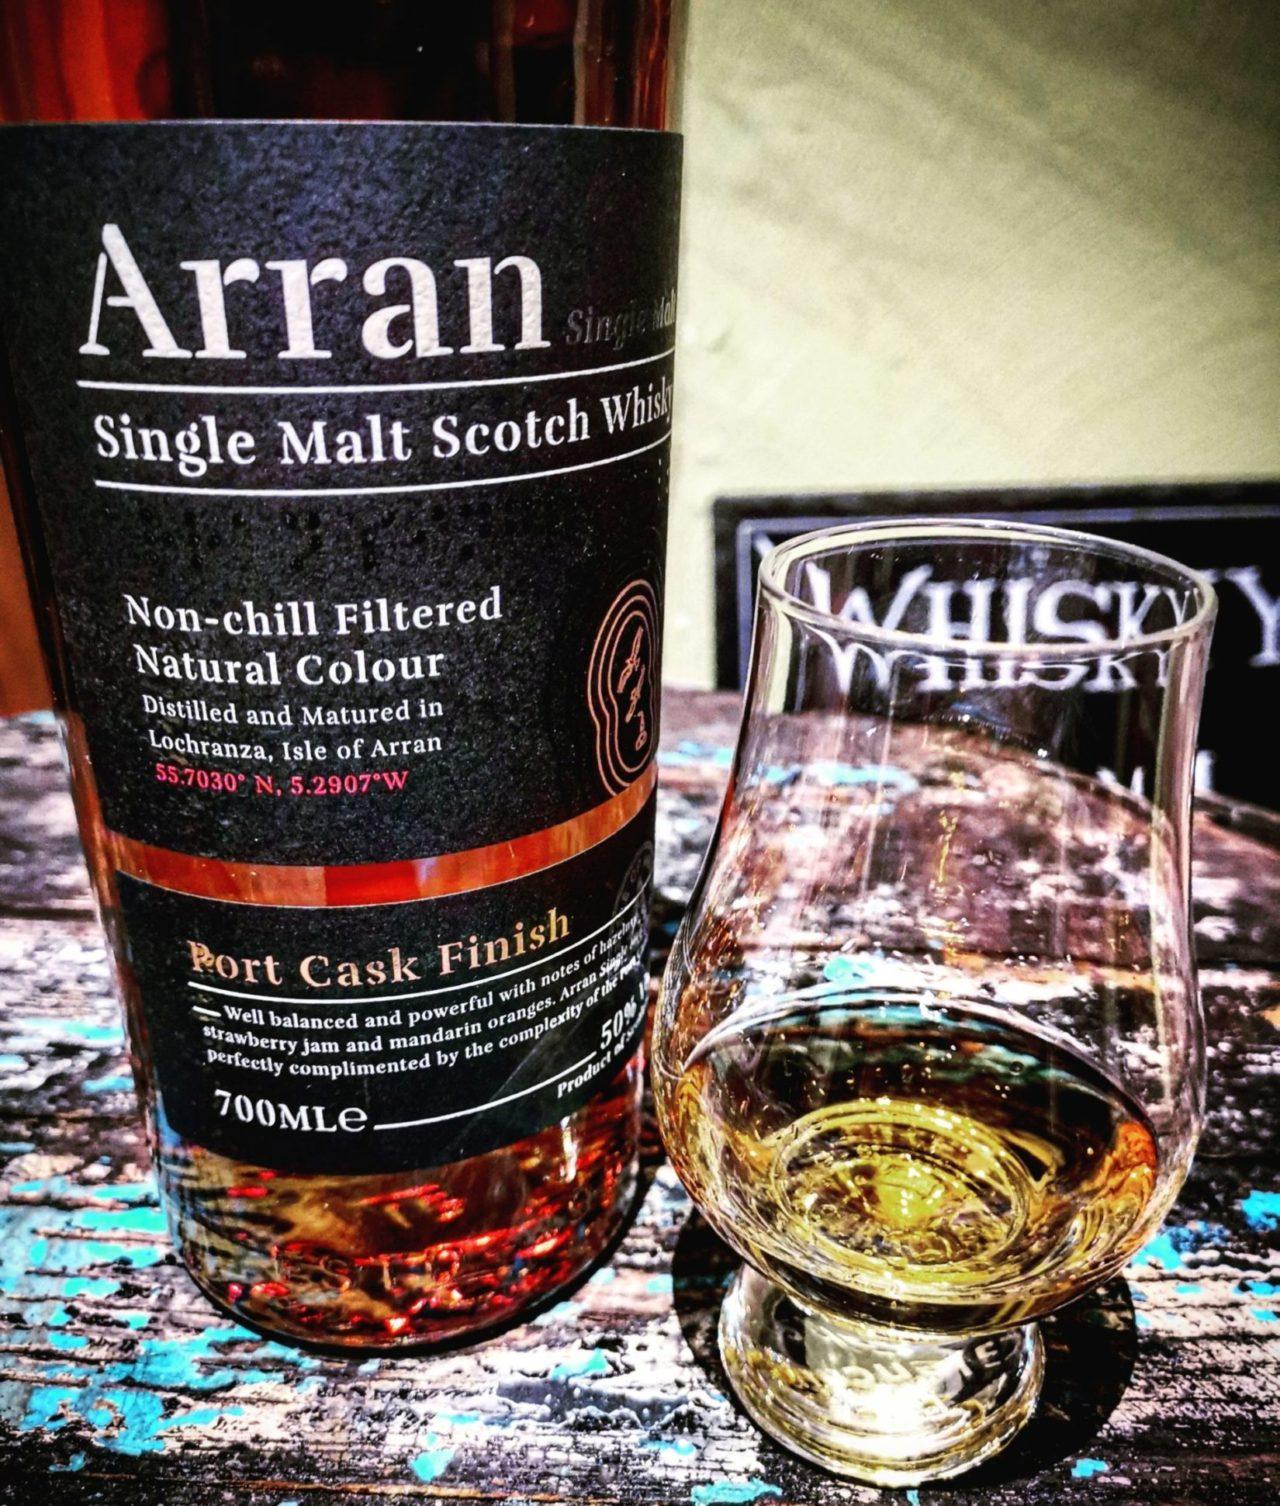 Arran Port Cask Finish Islands Single Malt Scotch Whisky